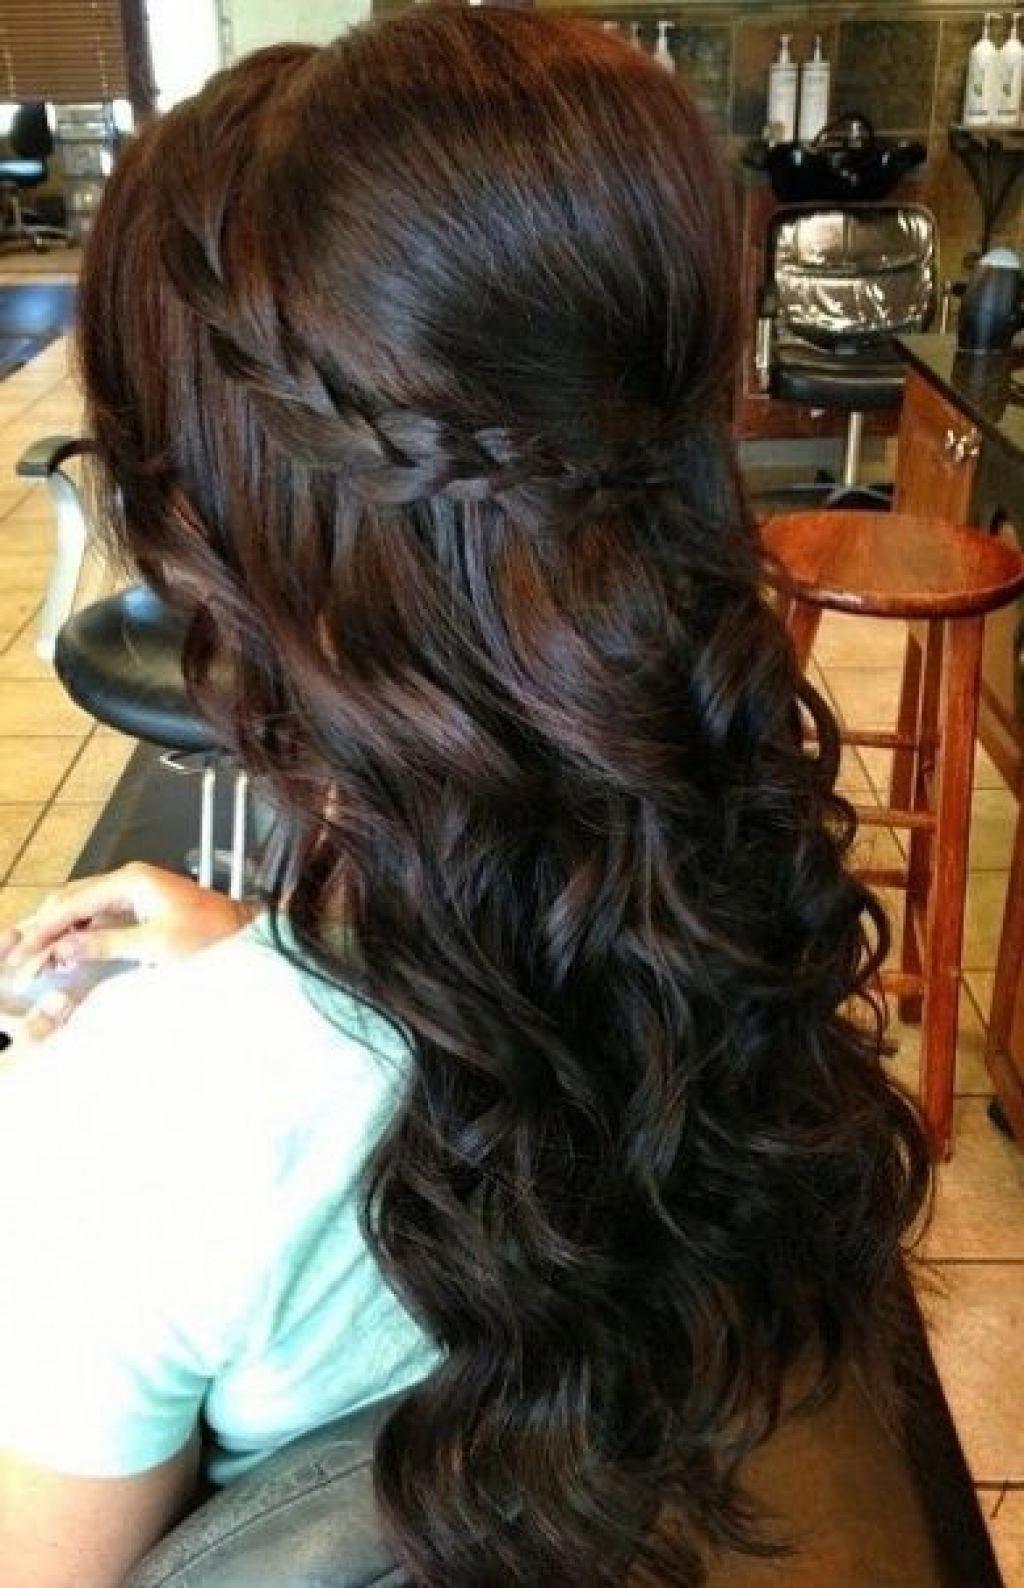 stylish braided hairstyles #halfbraidedhairstyles | hair in